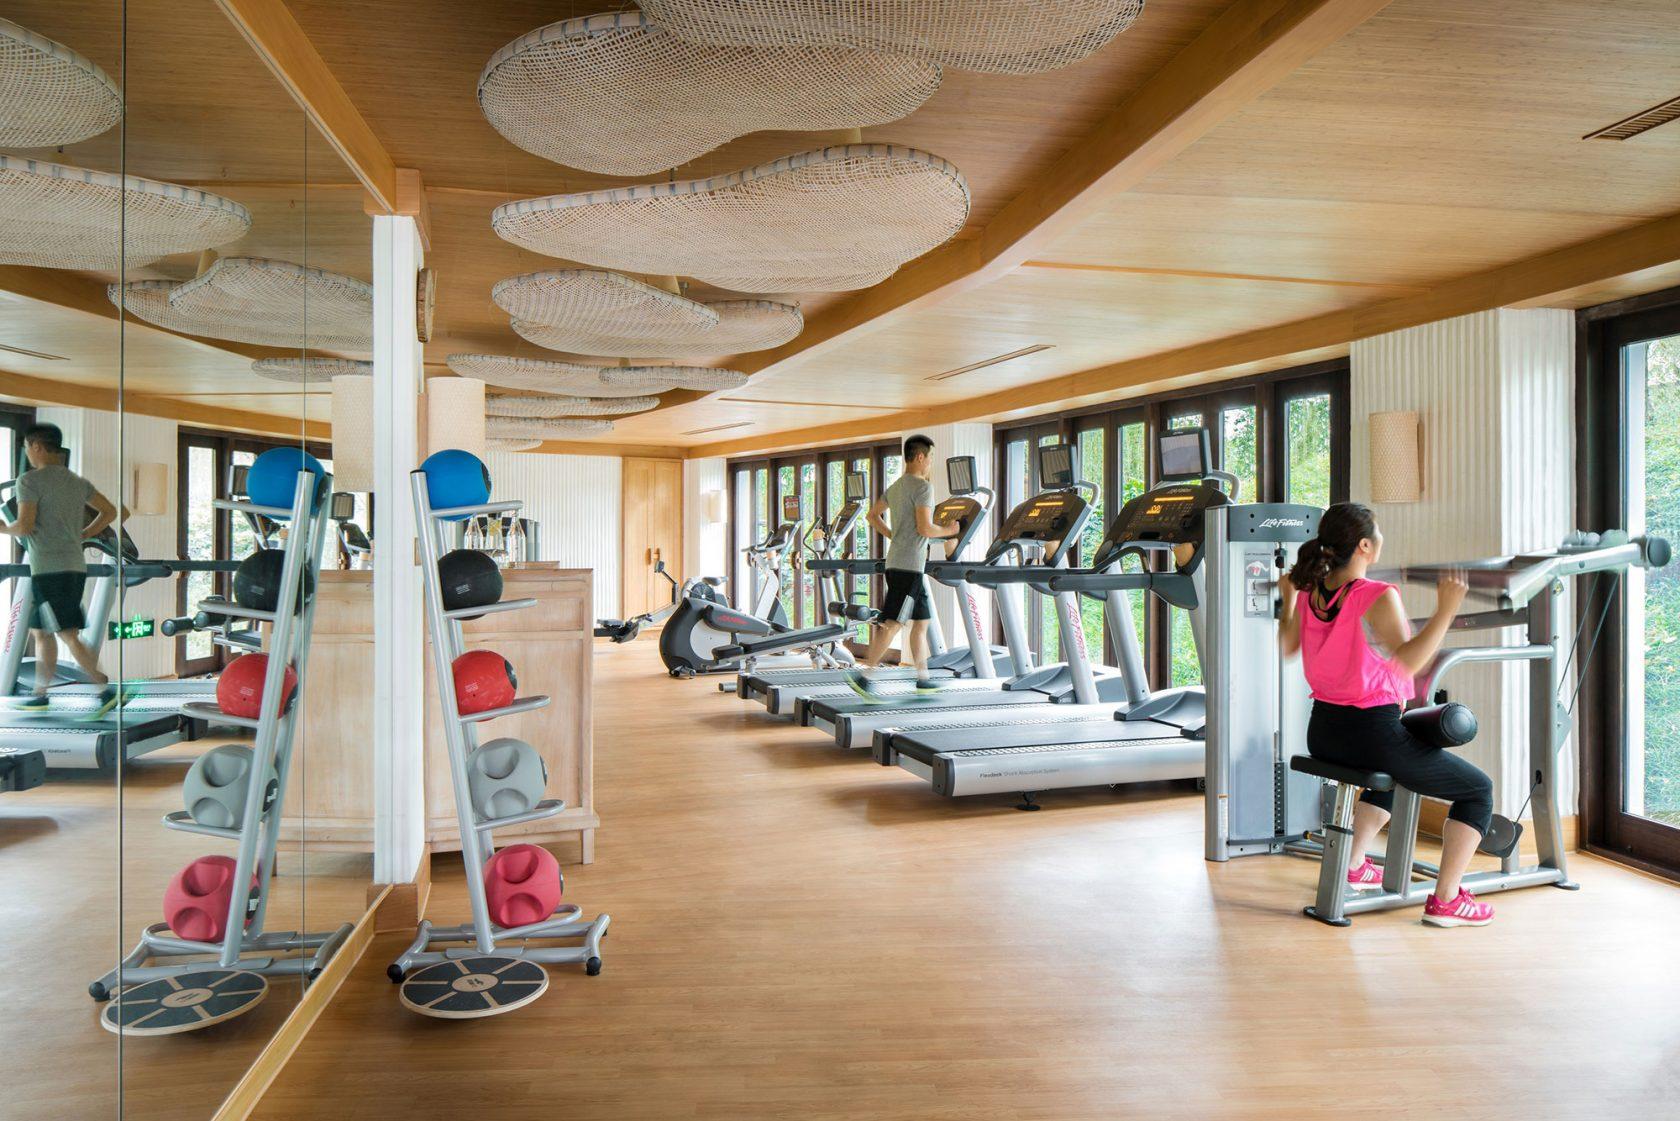 Six Senses Qing Cheng Mountain Gym